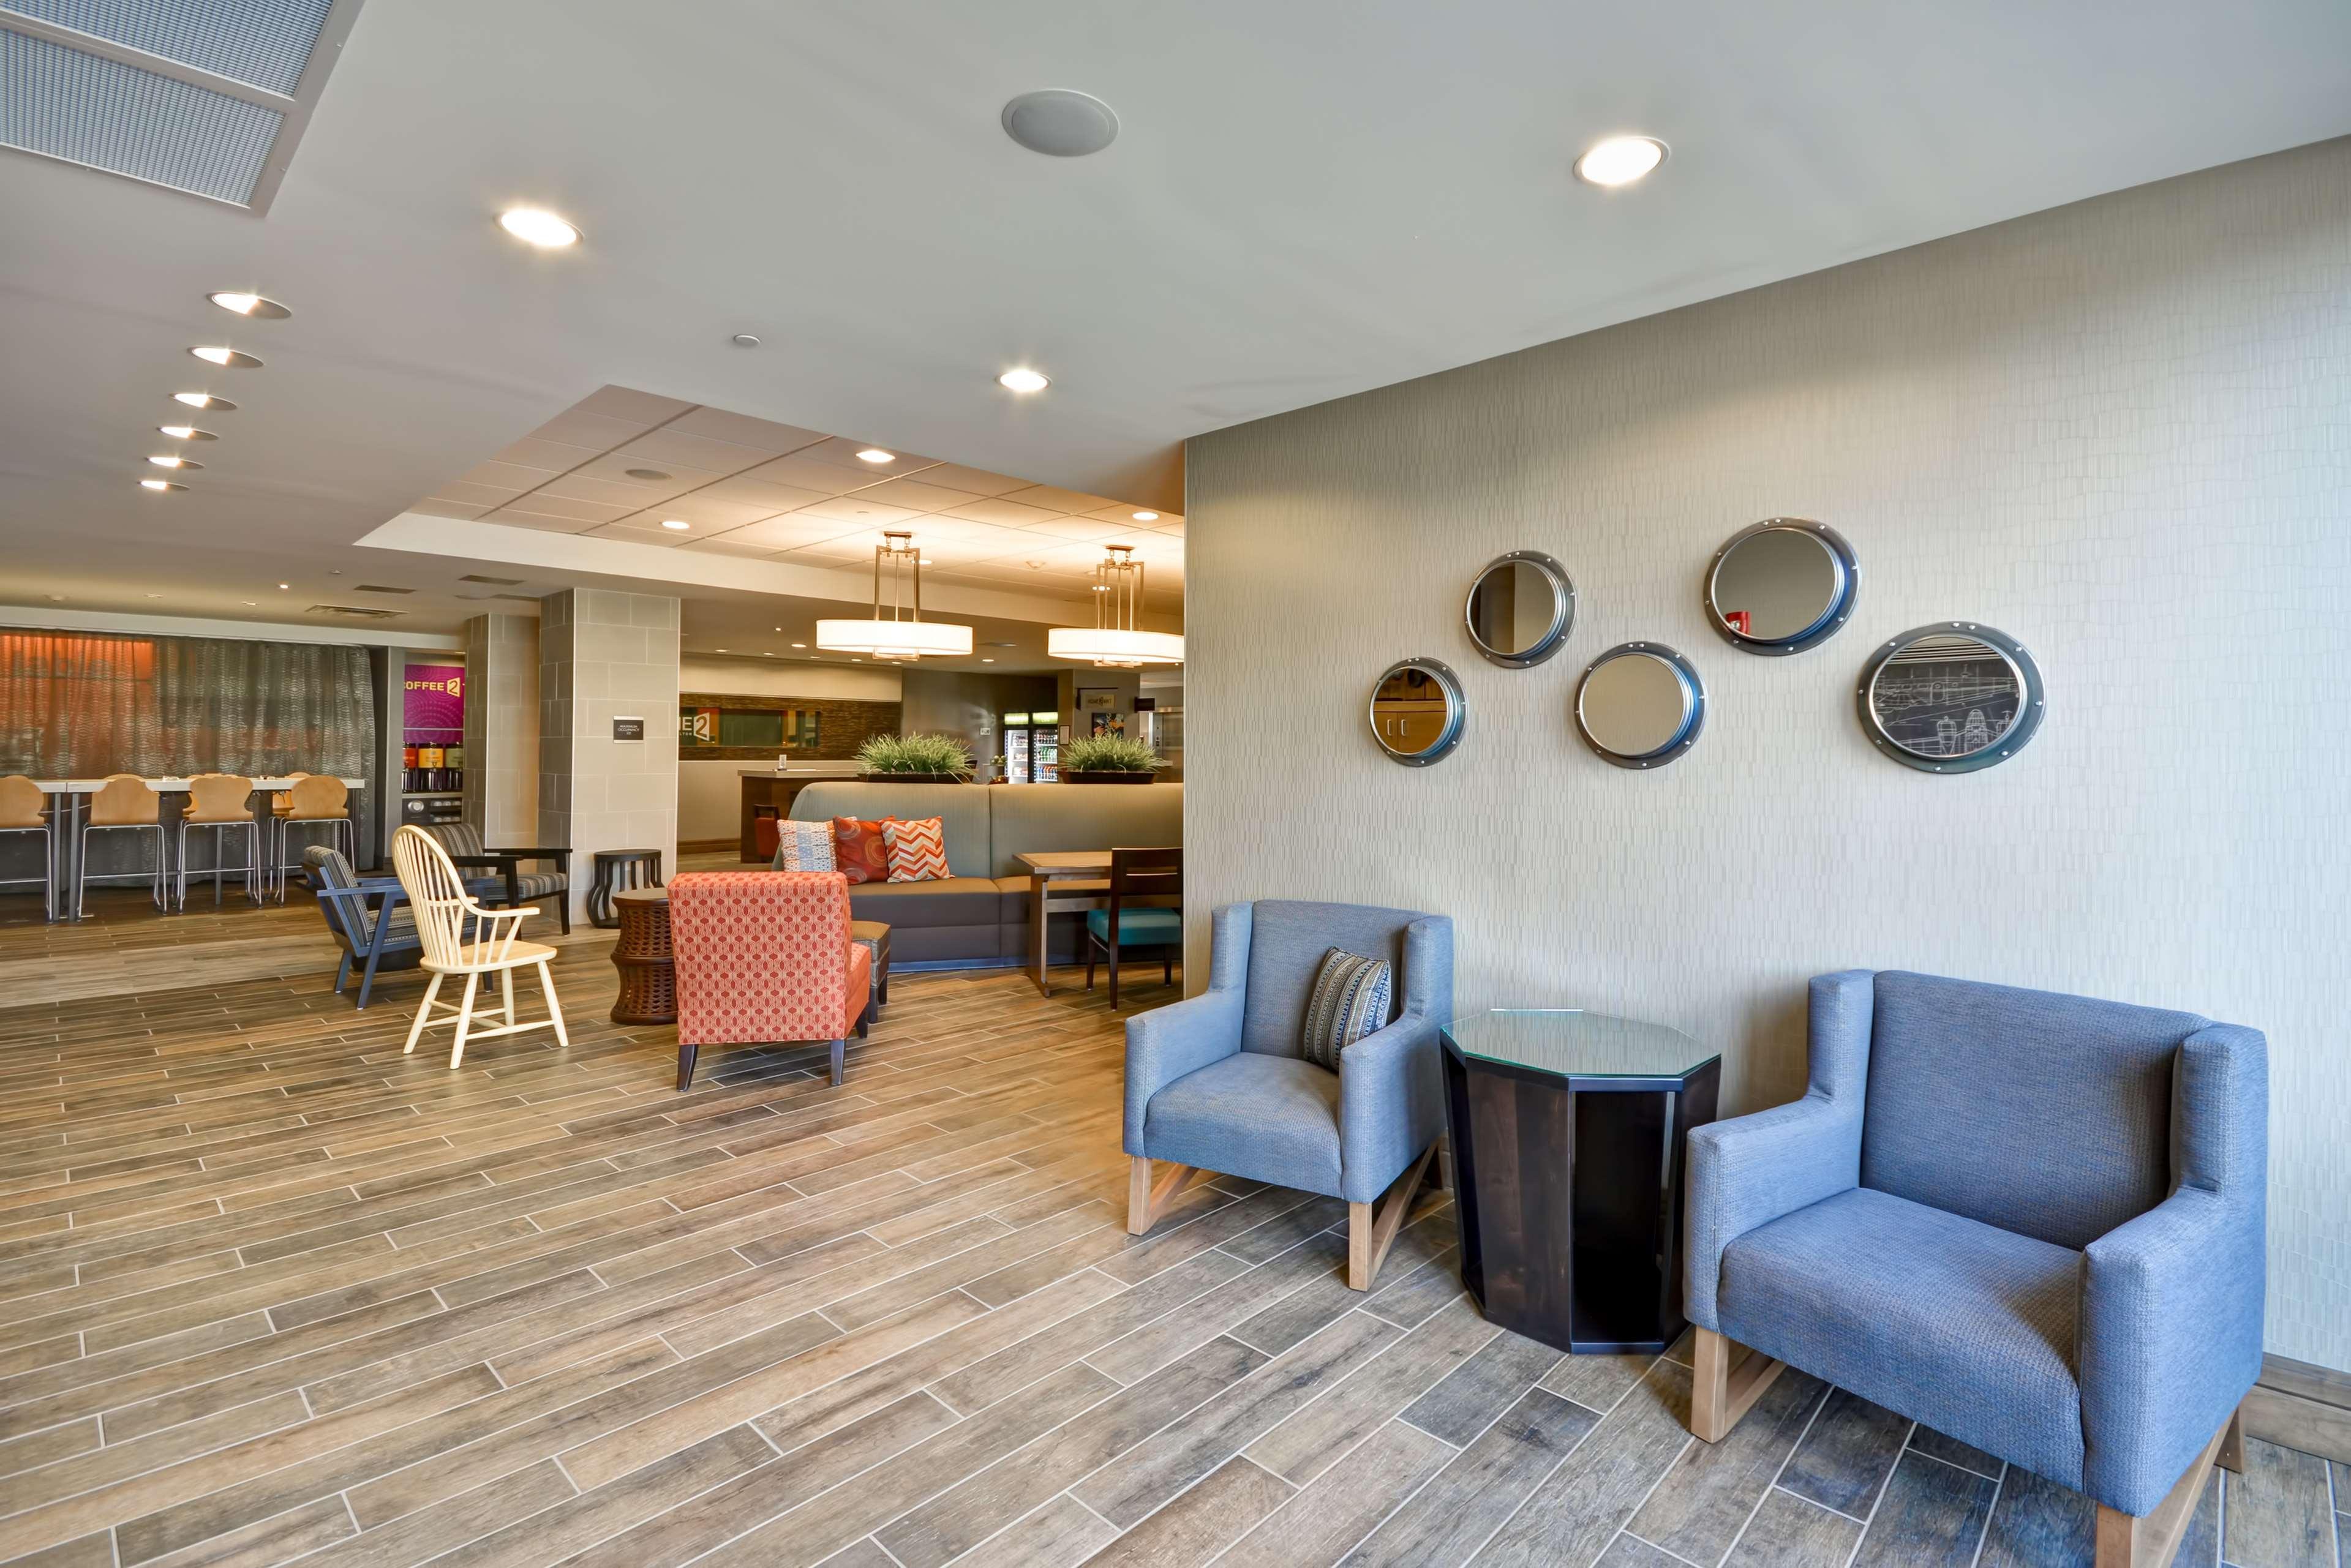 Home2 Suites by Hilton  St. Simons Island image 11